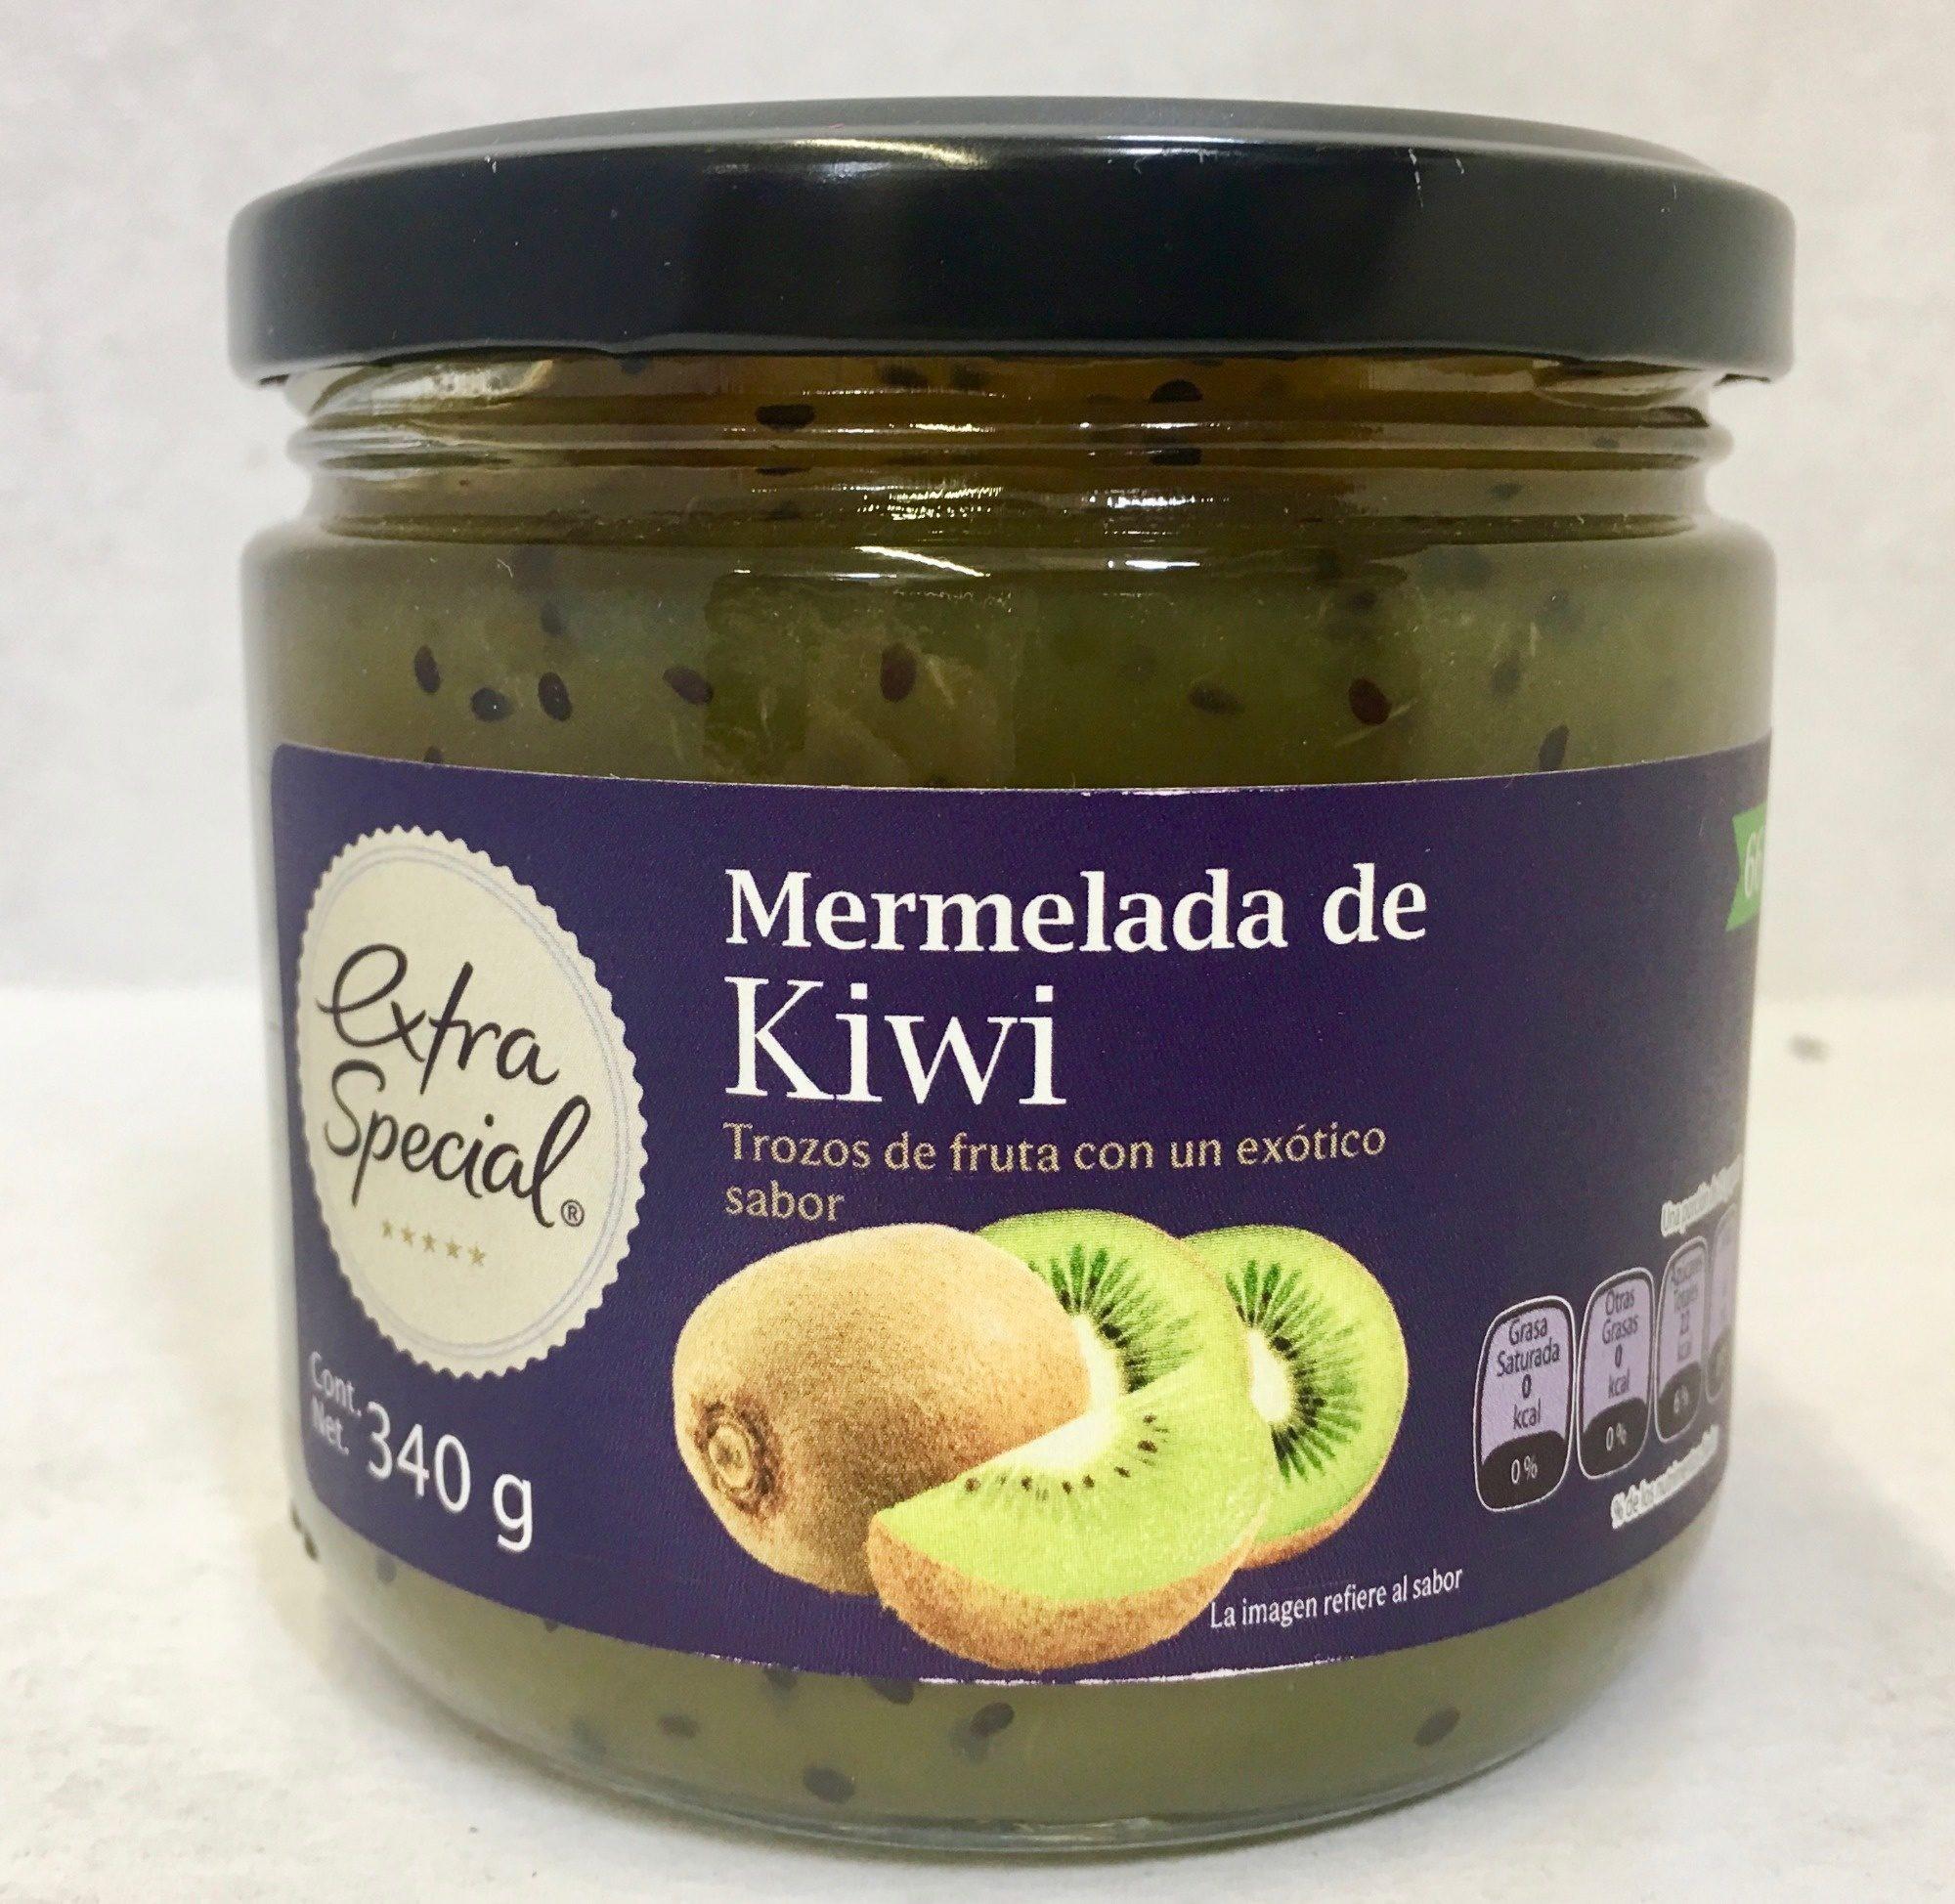 MERMELADA DE KIWI - Product - es